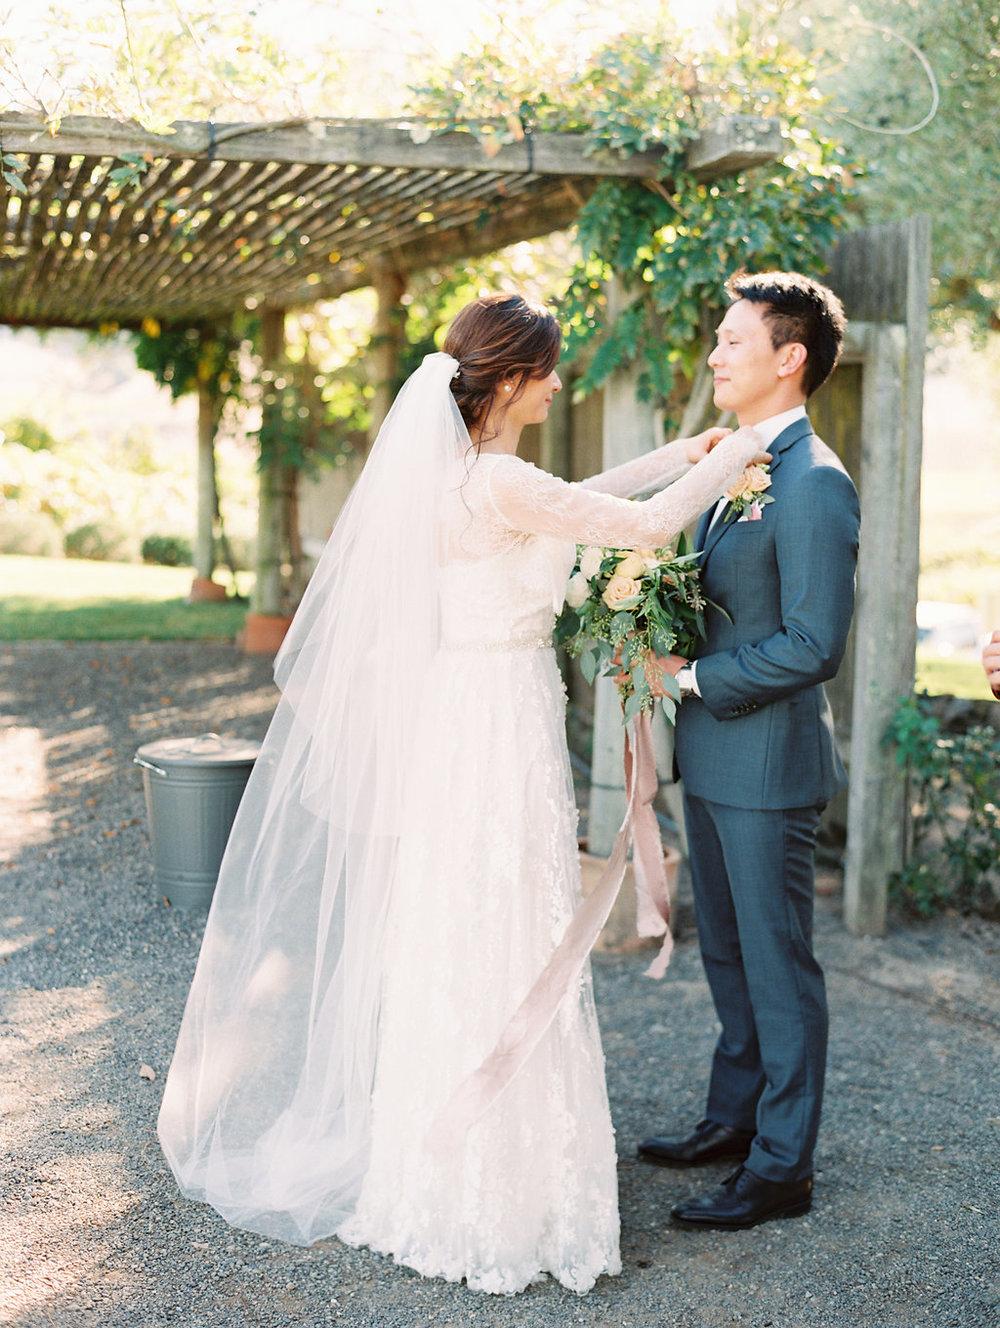 San Francisco Fine Art Wedding Photographer | Napa Valley Sonoma Wedding